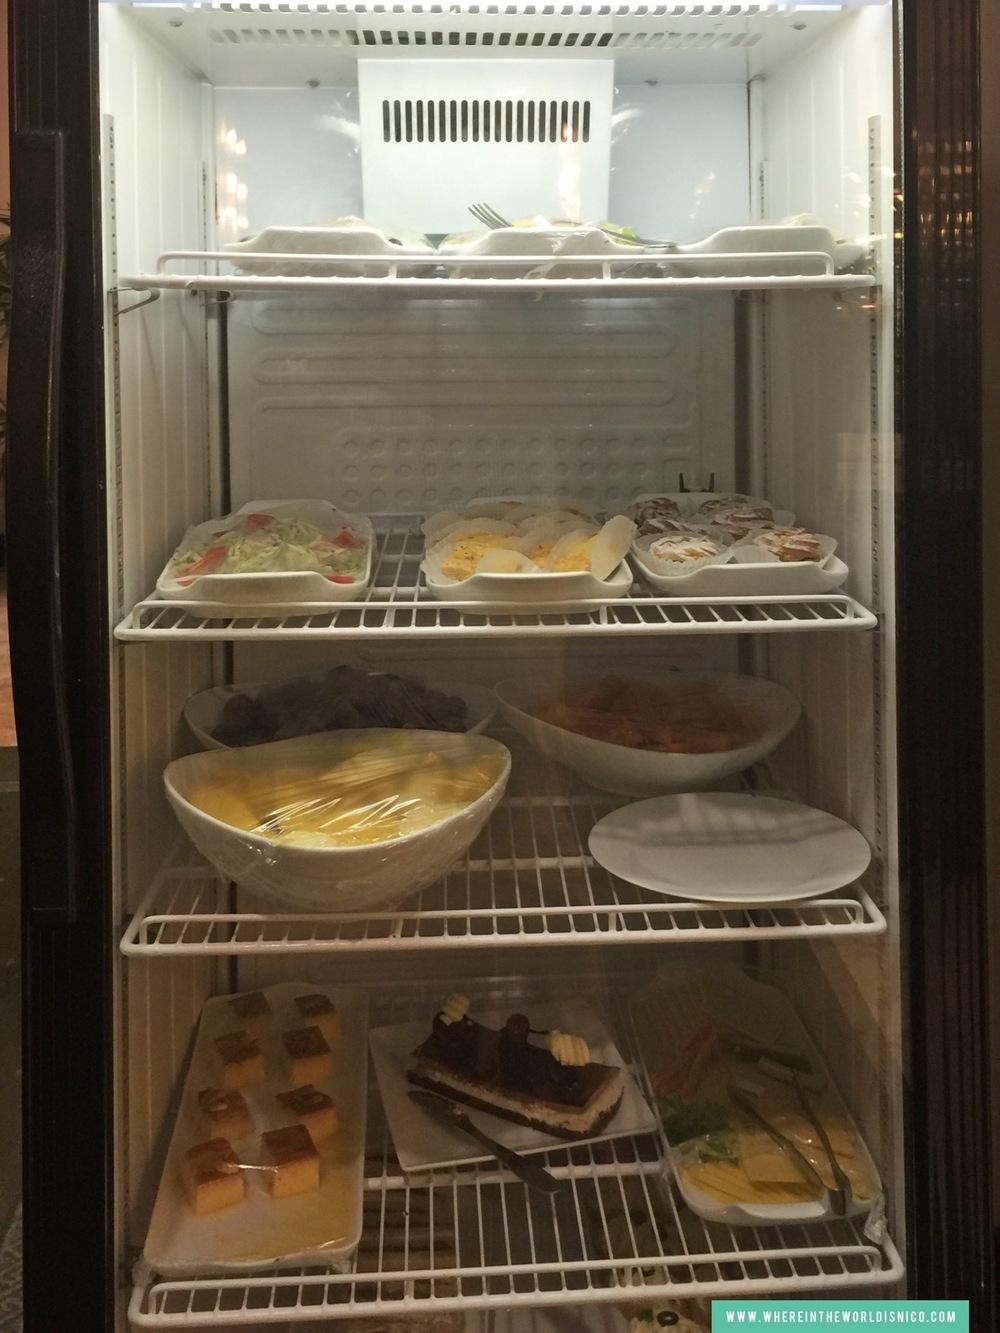 lotus-lounge-cmb-dessert-fridge.JPG